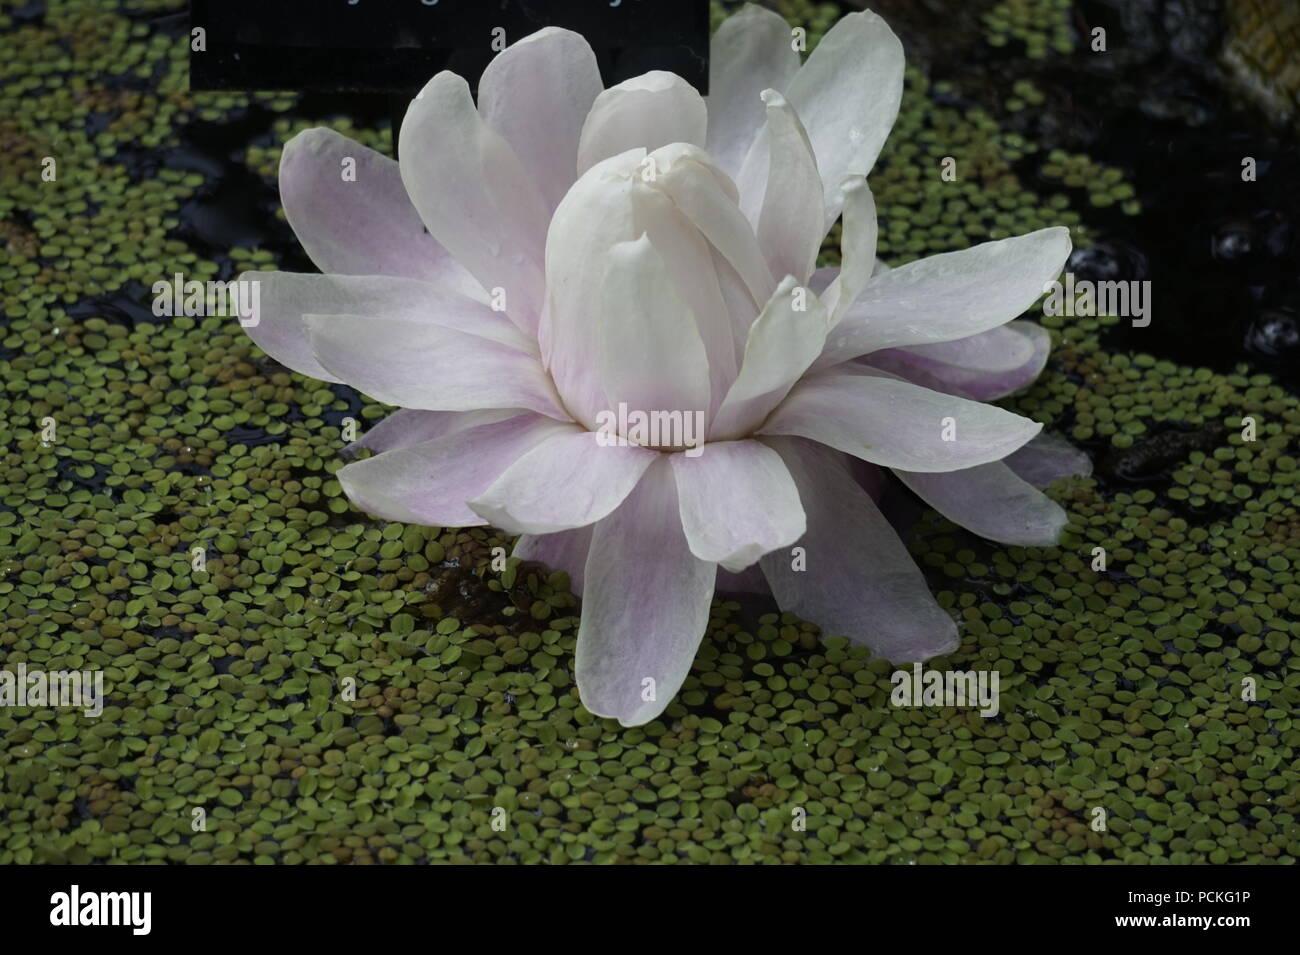 national flower of guyana stock photos national flower of guyana